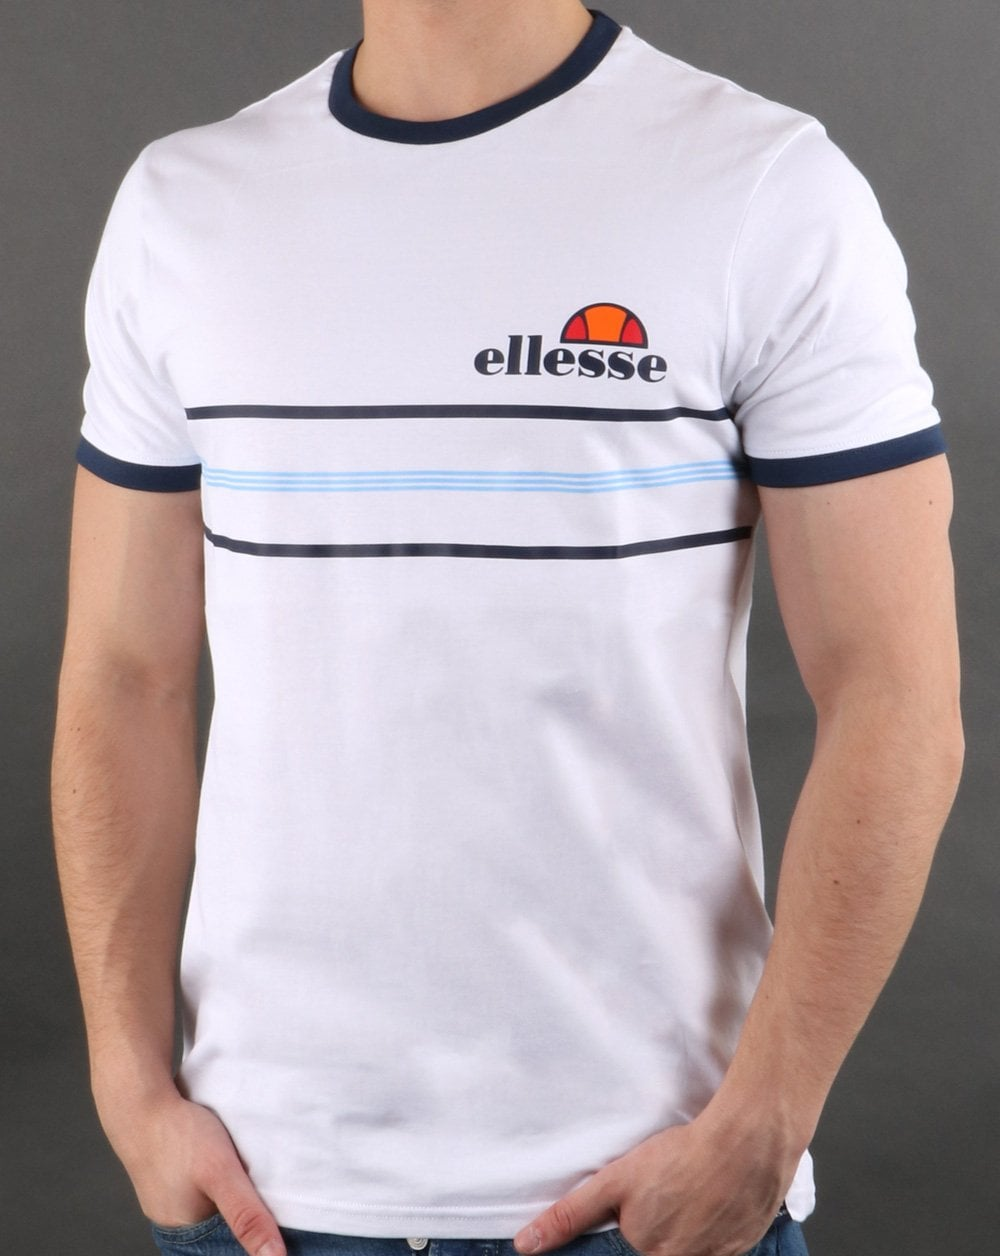 Ellesse Gentario T Shirt White